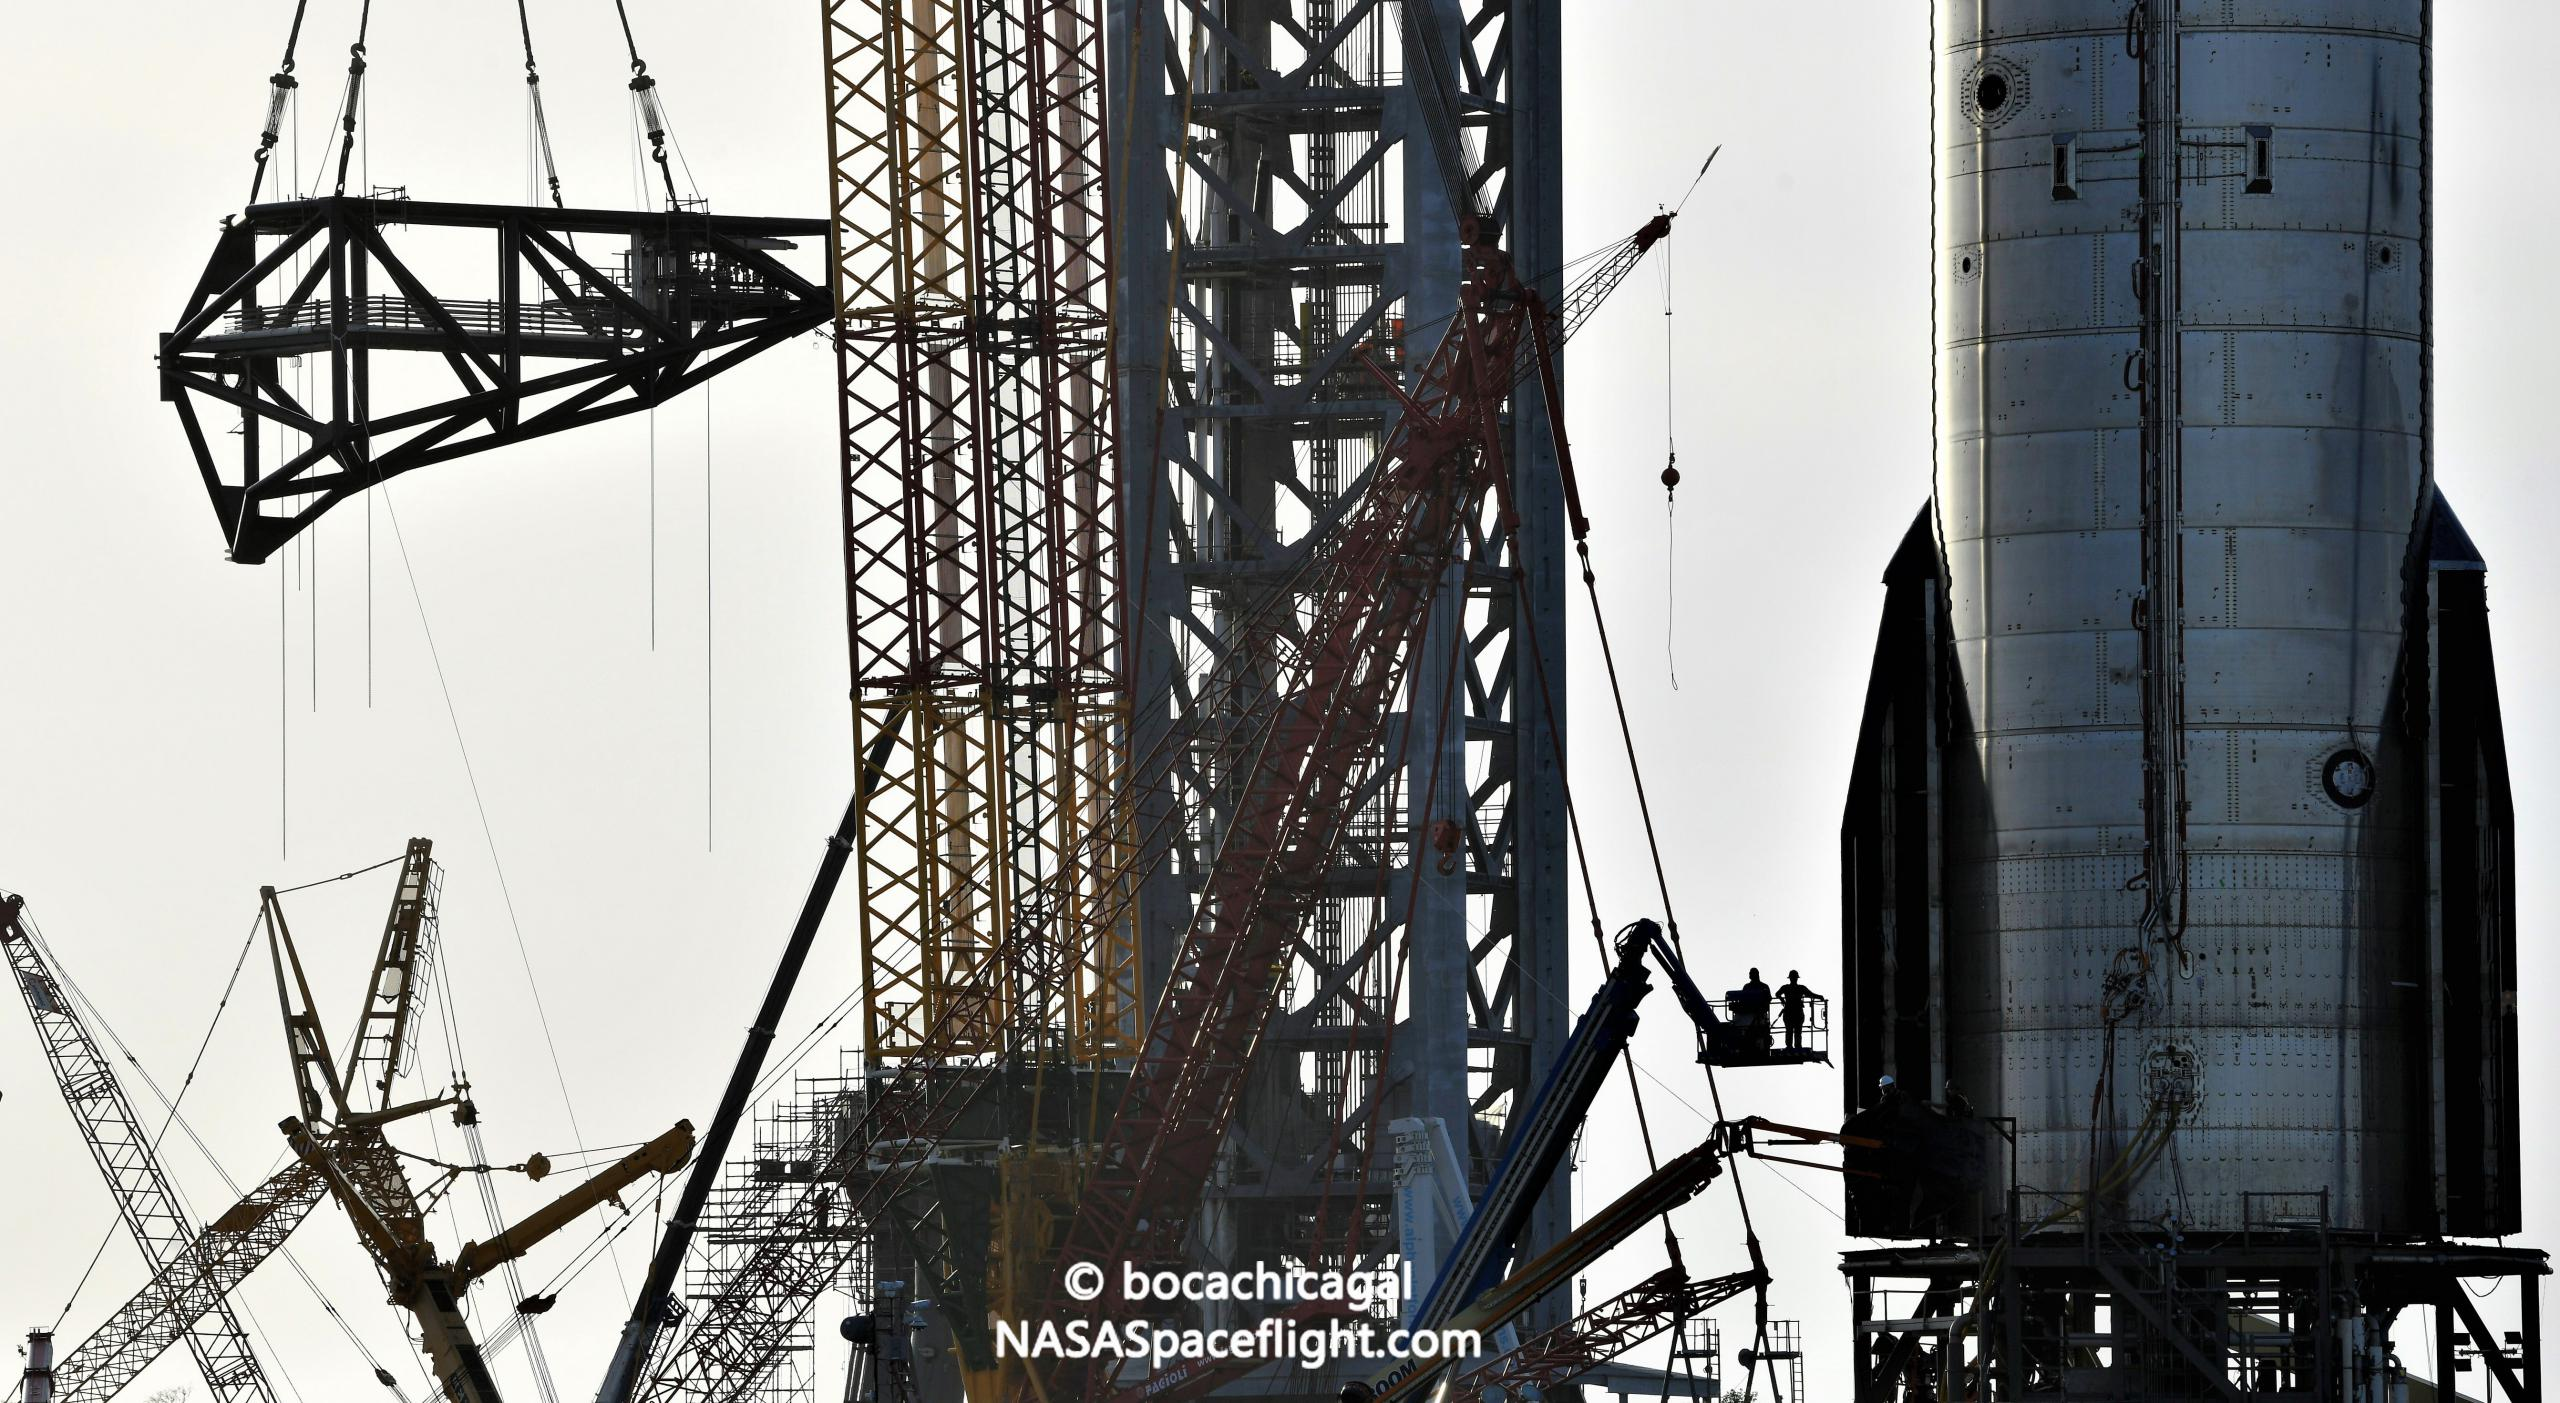 Starship Boca Chica 082921 (NASASpaceflight – bocachicagal) tower QD arm install + S20 2 crop 2 (2) (c)